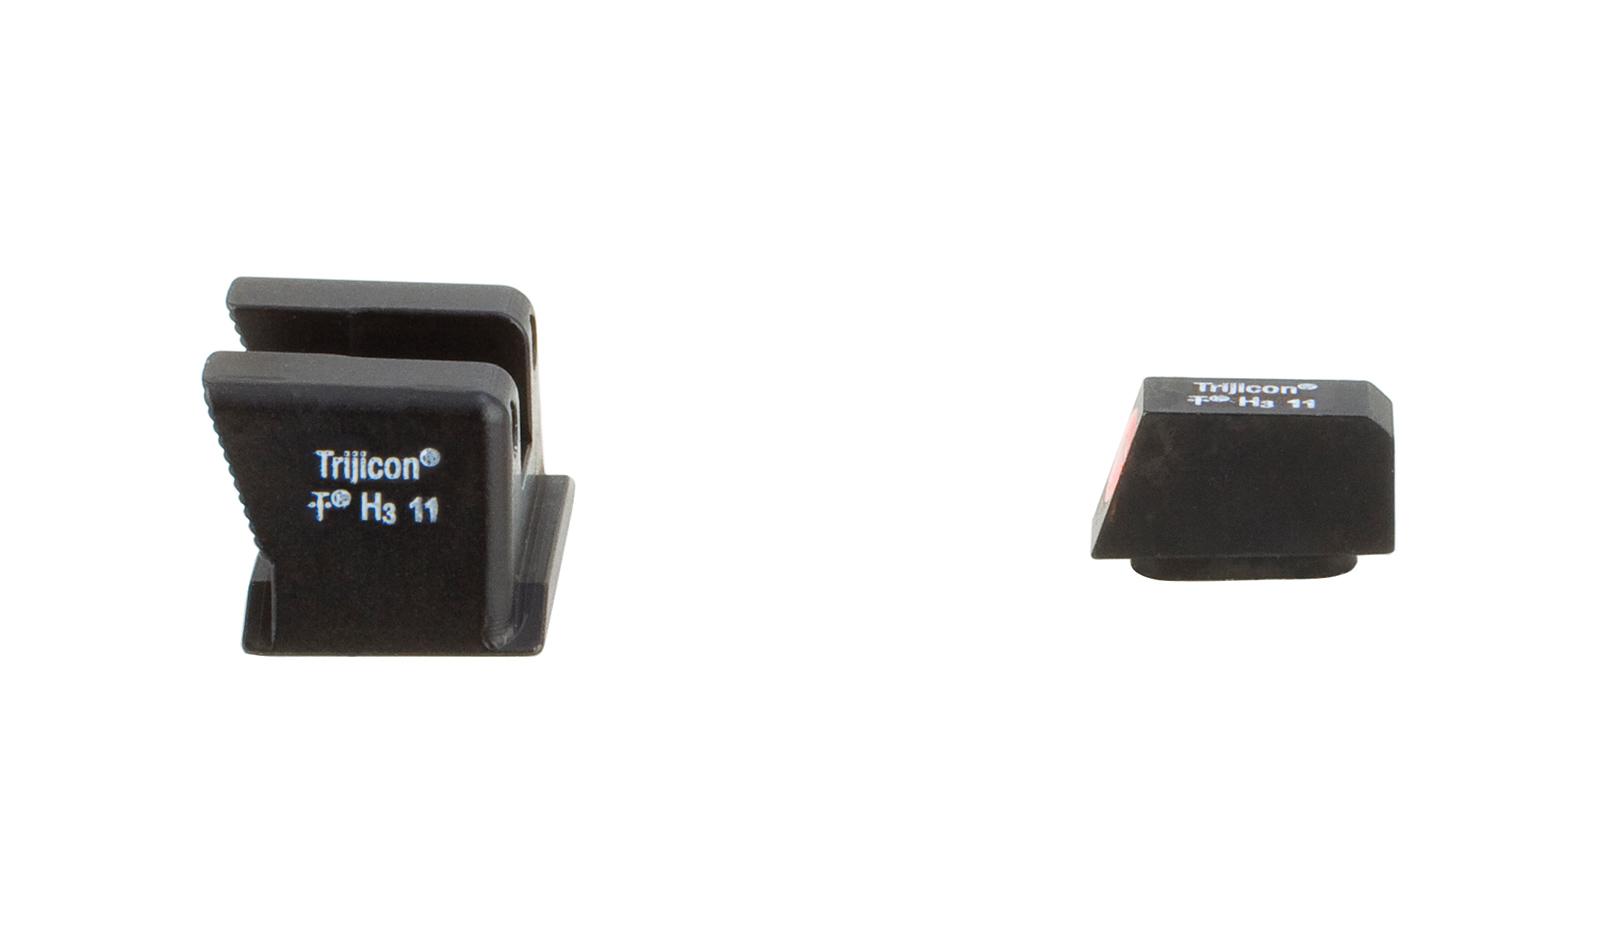 WP102-C-600743 angle 2